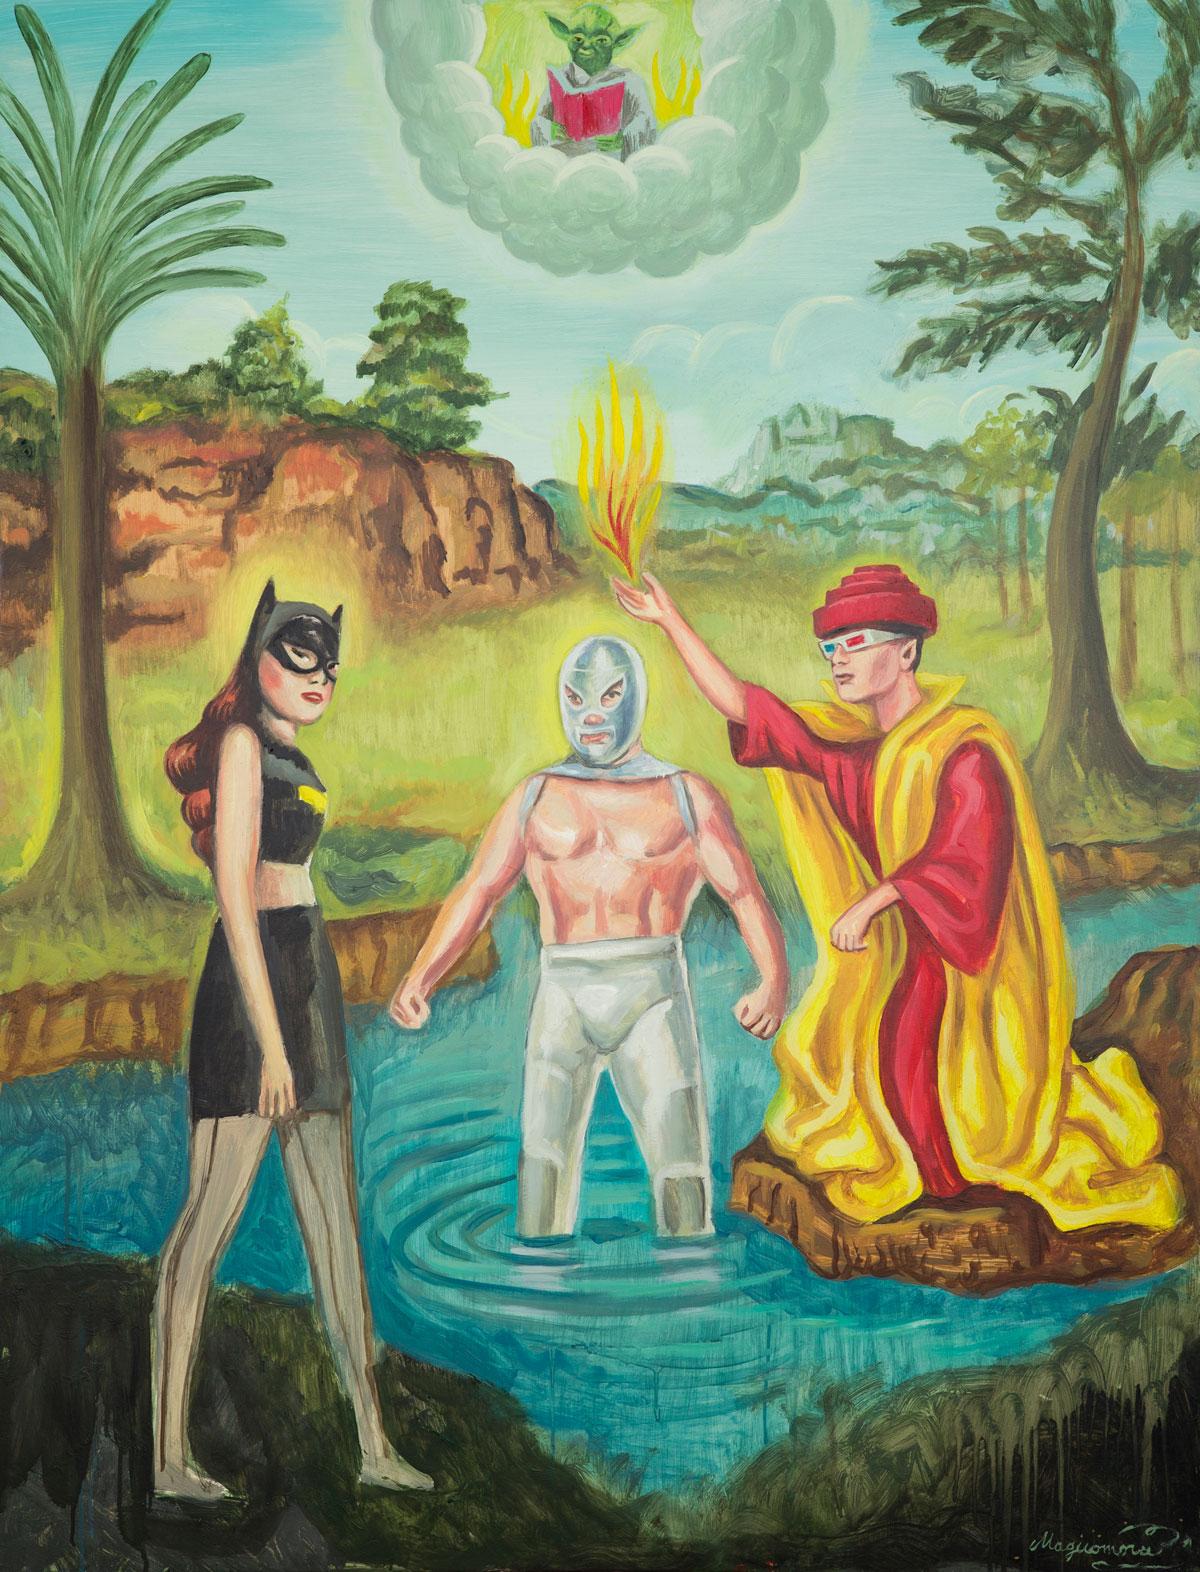 Sergio Mora, The Power of Fiction, 2020, olio su tela, 89x116 cm